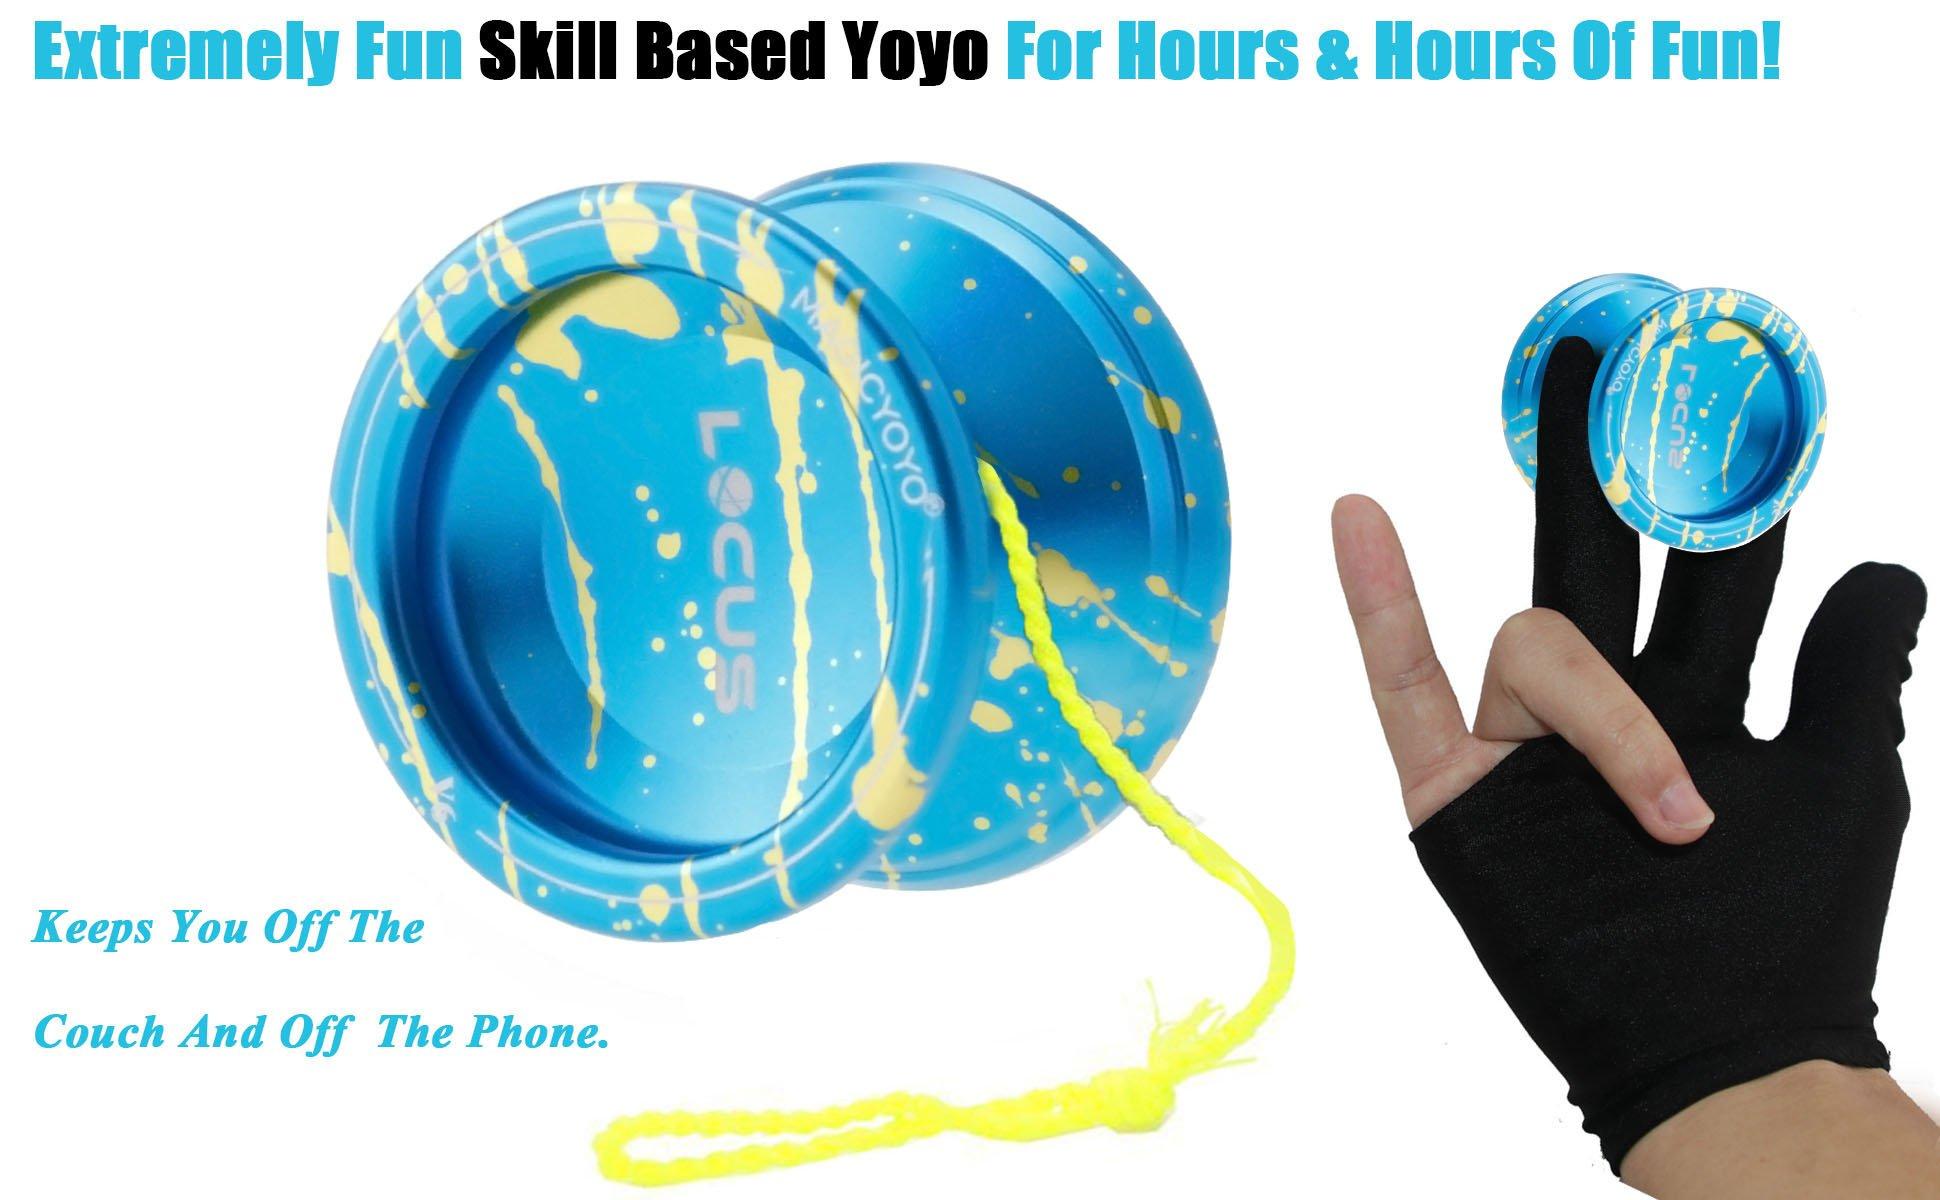 MAGICYOYO Responsive V6 Locus Aluminum YoYo Star Logo for Kids Beginner Learner with Yoyo Bag, Yoyo Glove and 5 Spinning Strings -Blue Splash Yellow